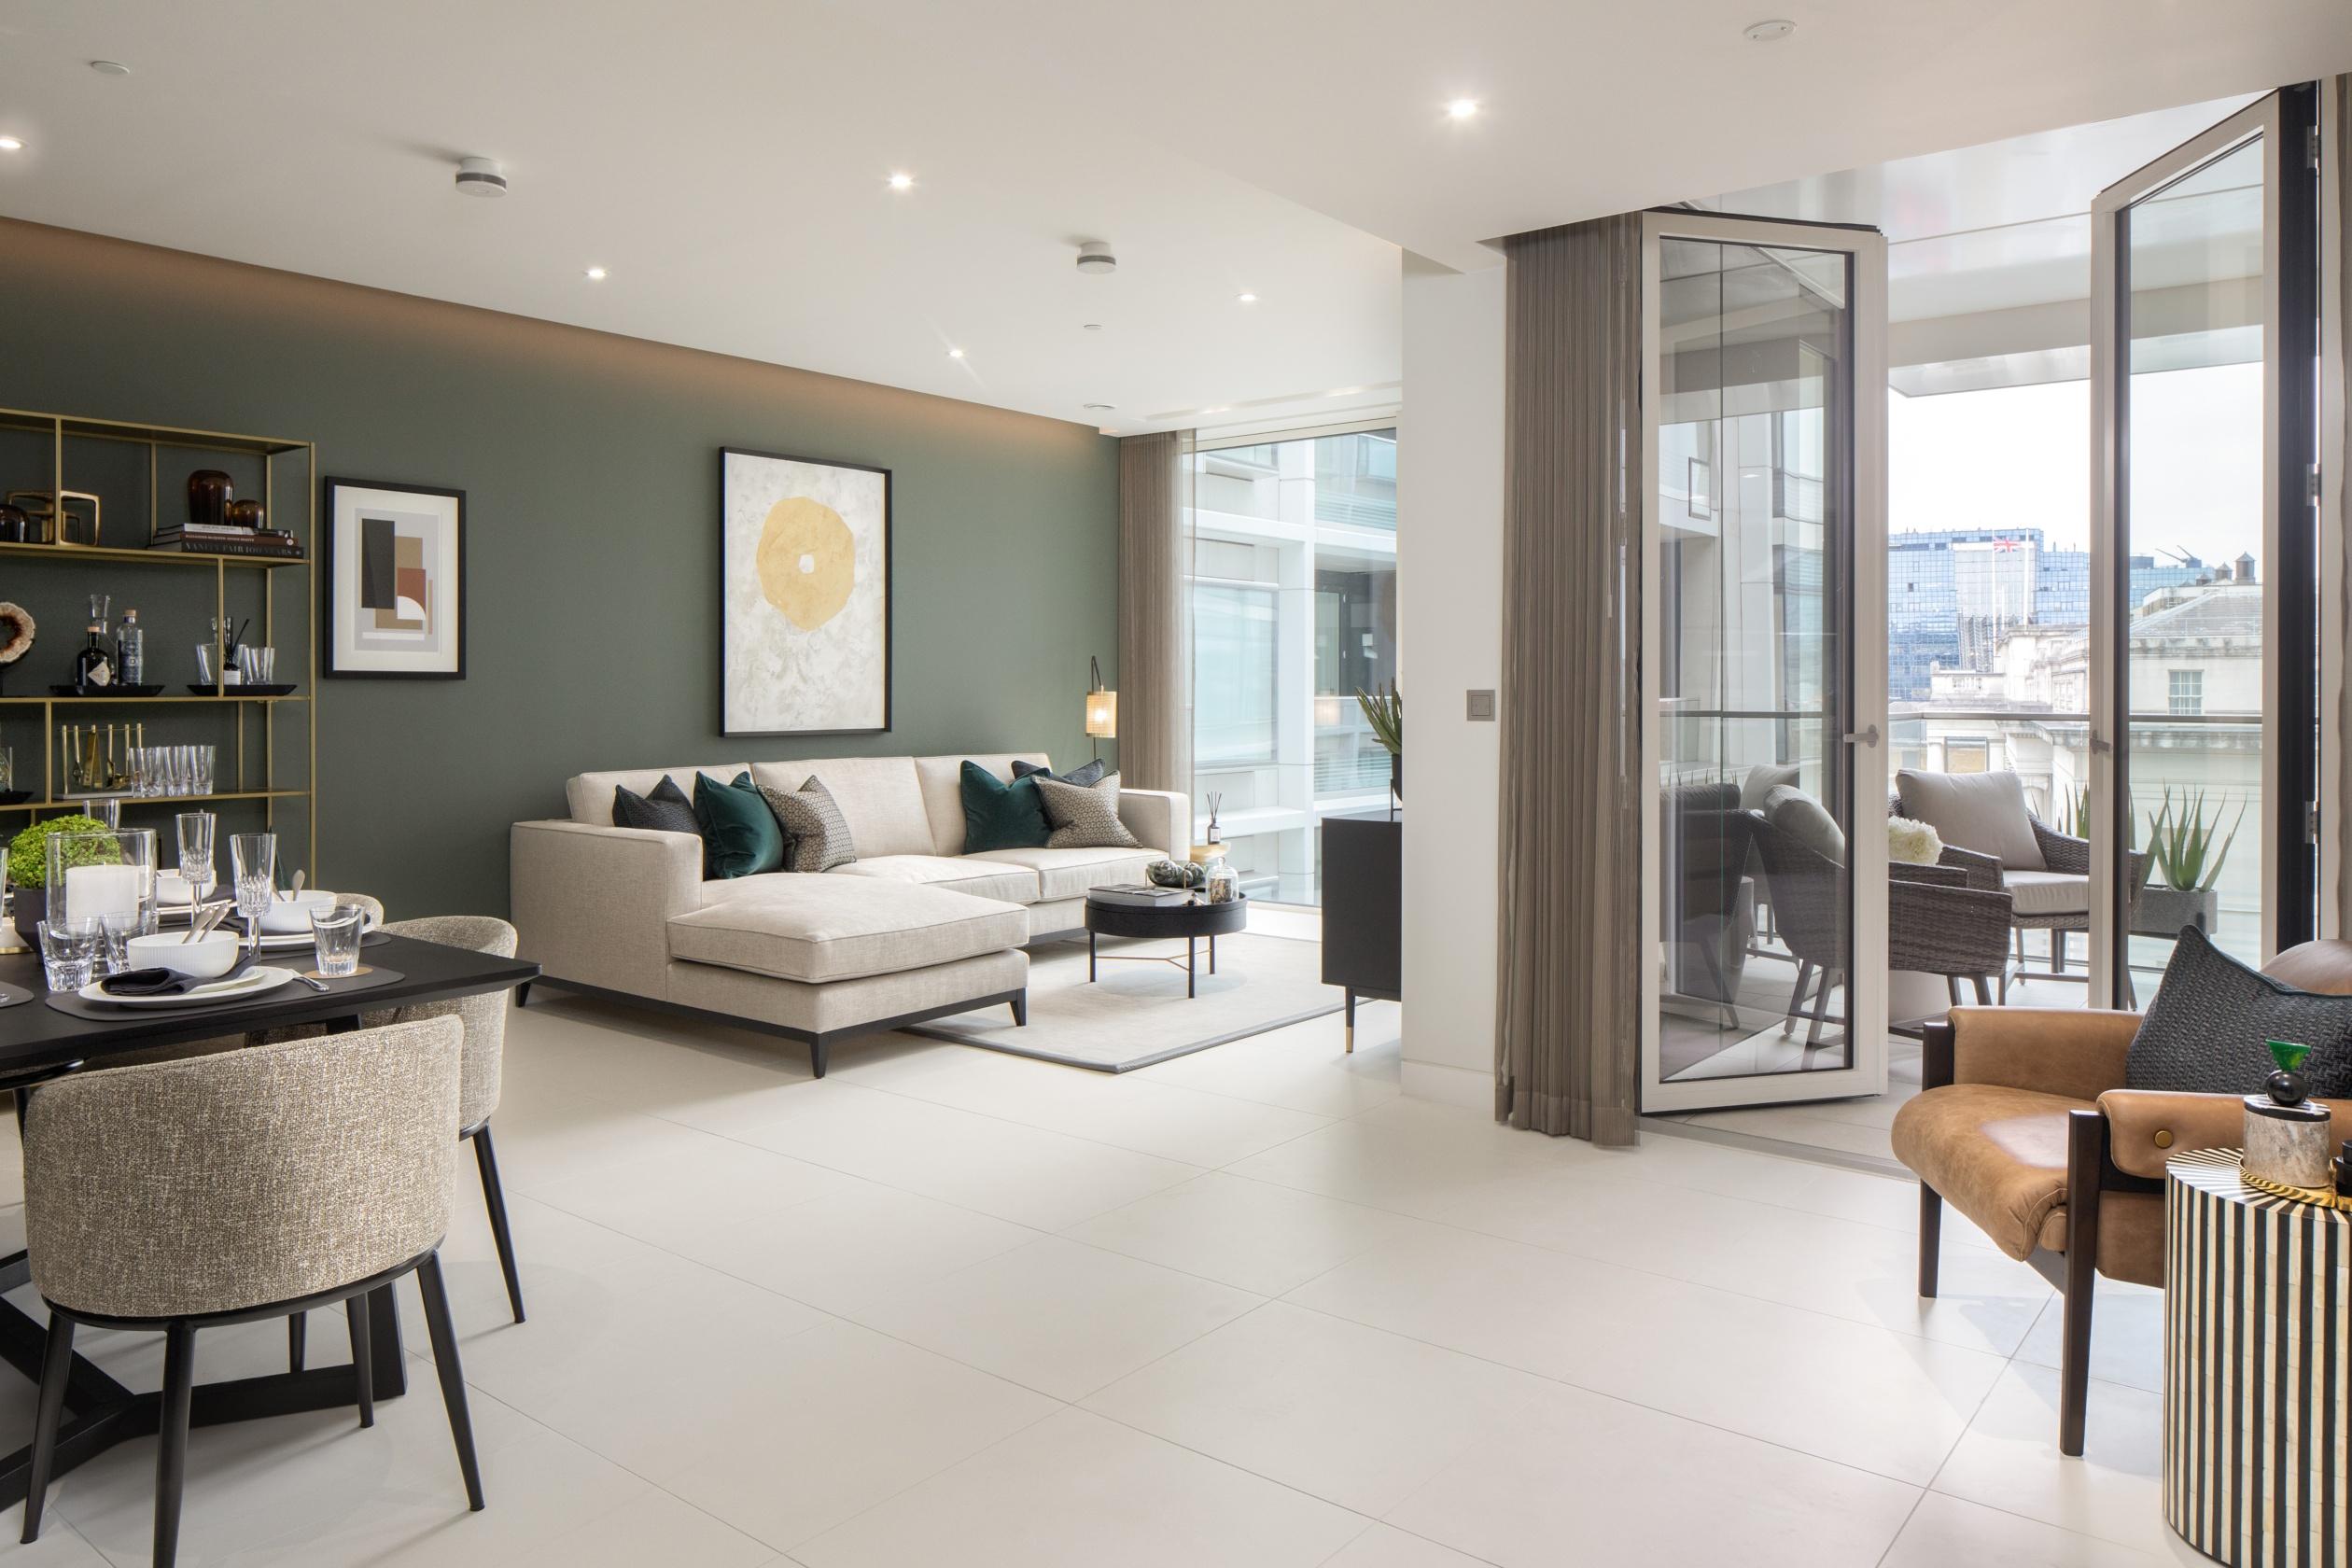 landmark place new homes in london greater london barratt homes rh barratthomes co uk